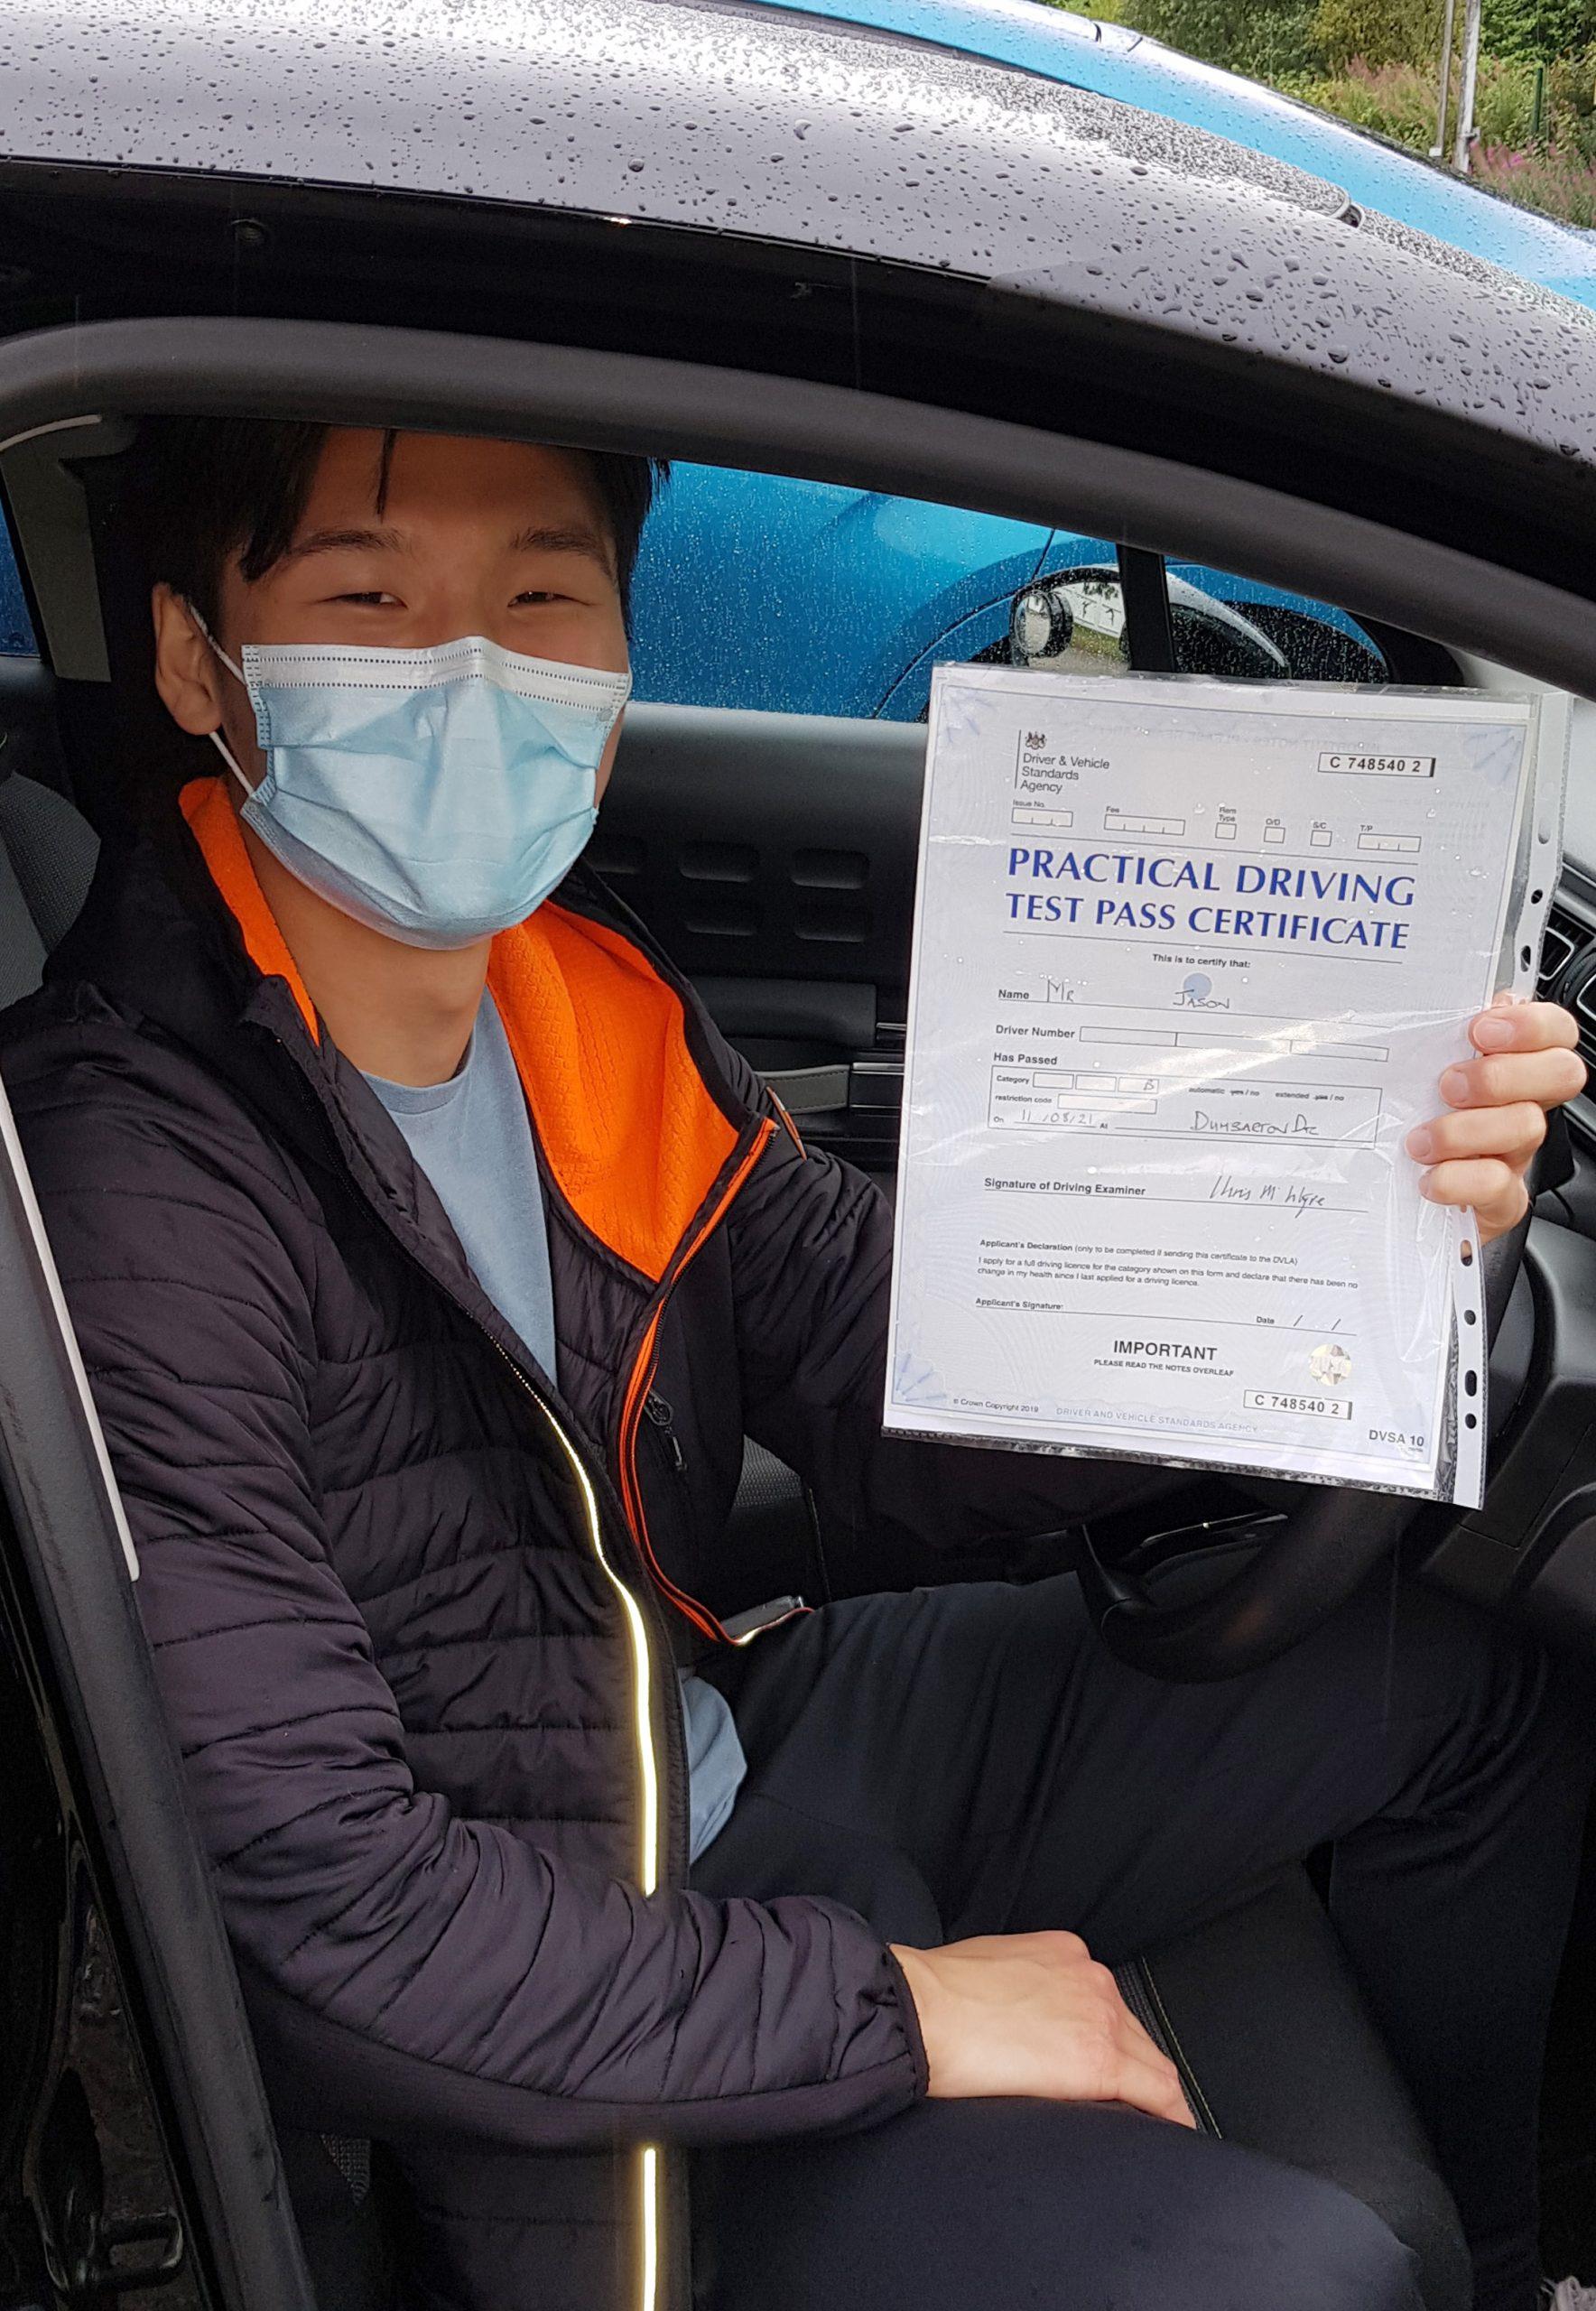 Driving test pass